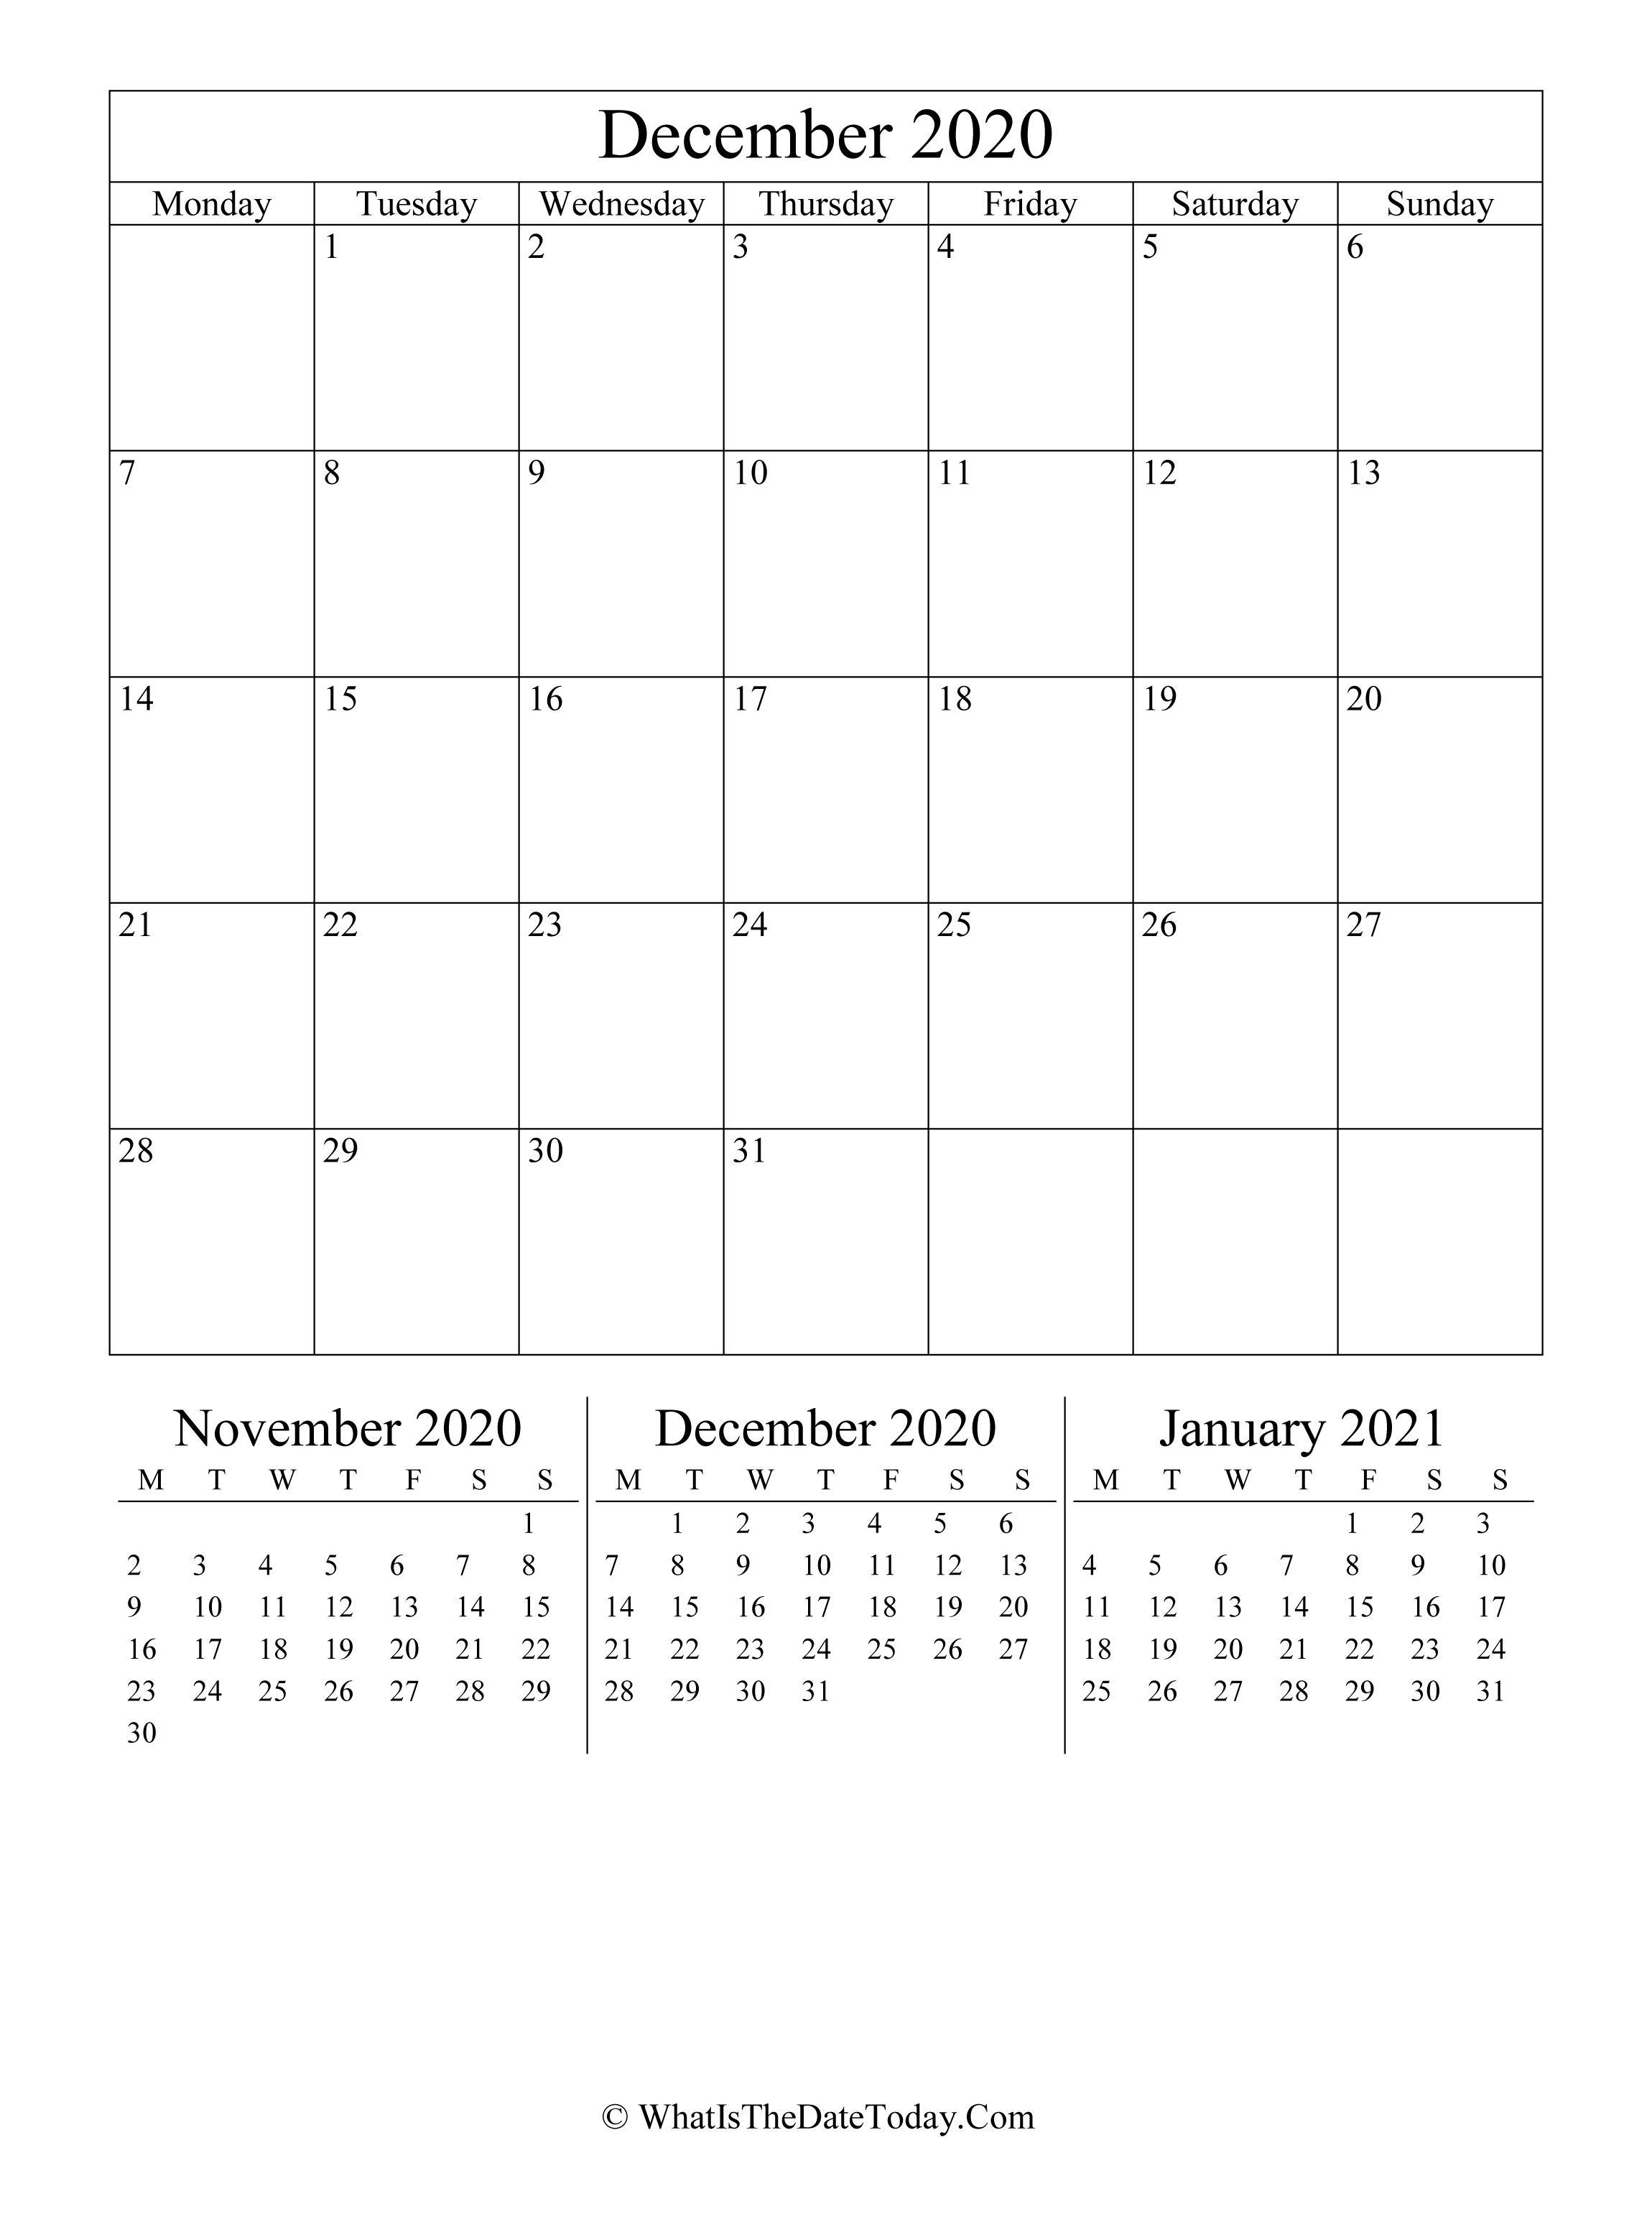 December 2020 Editable Calendar Vertical Layout Whatisthedatetoday Com